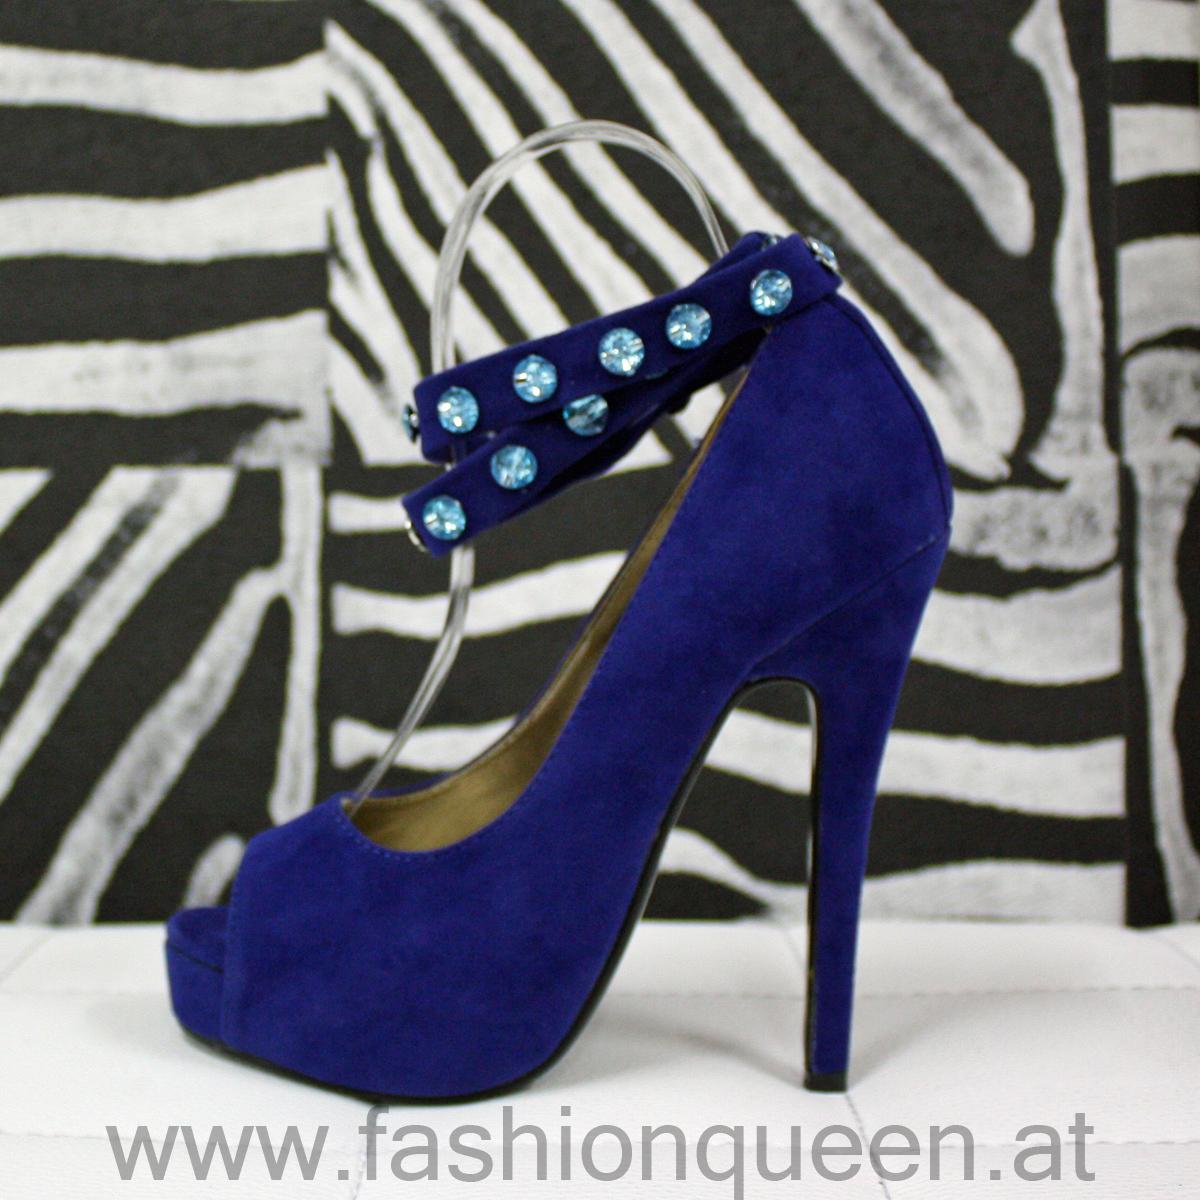 edle peep toe high heels plateau blau diamanten neu 35 ebay. Black Bedroom Furniture Sets. Home Design Ideas